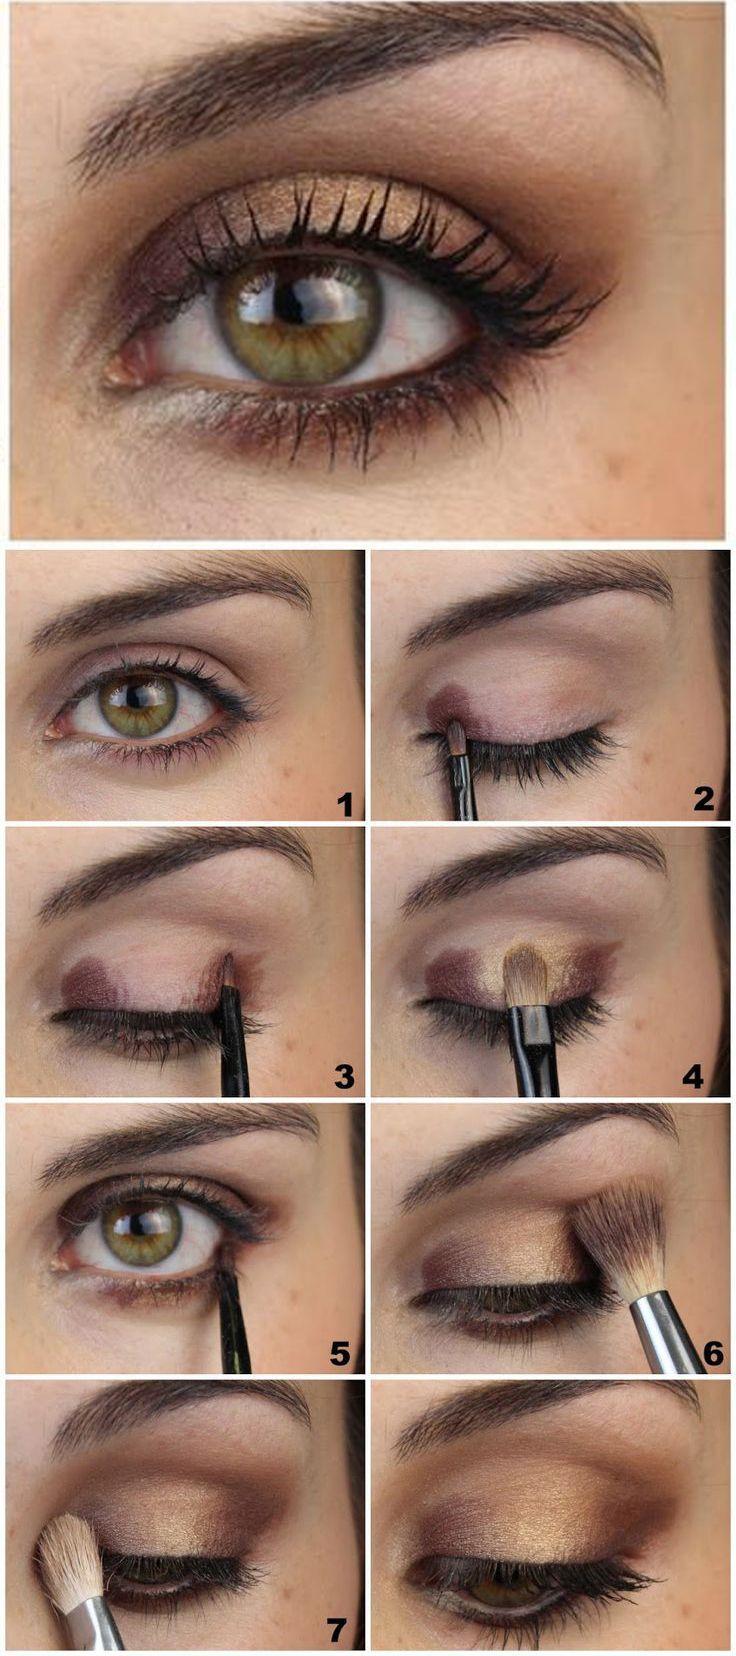 zozopuffpuff makeup tipp 39 s pinterest make up augen. Black Bedroom Furniture Sets. Home Design Ideas